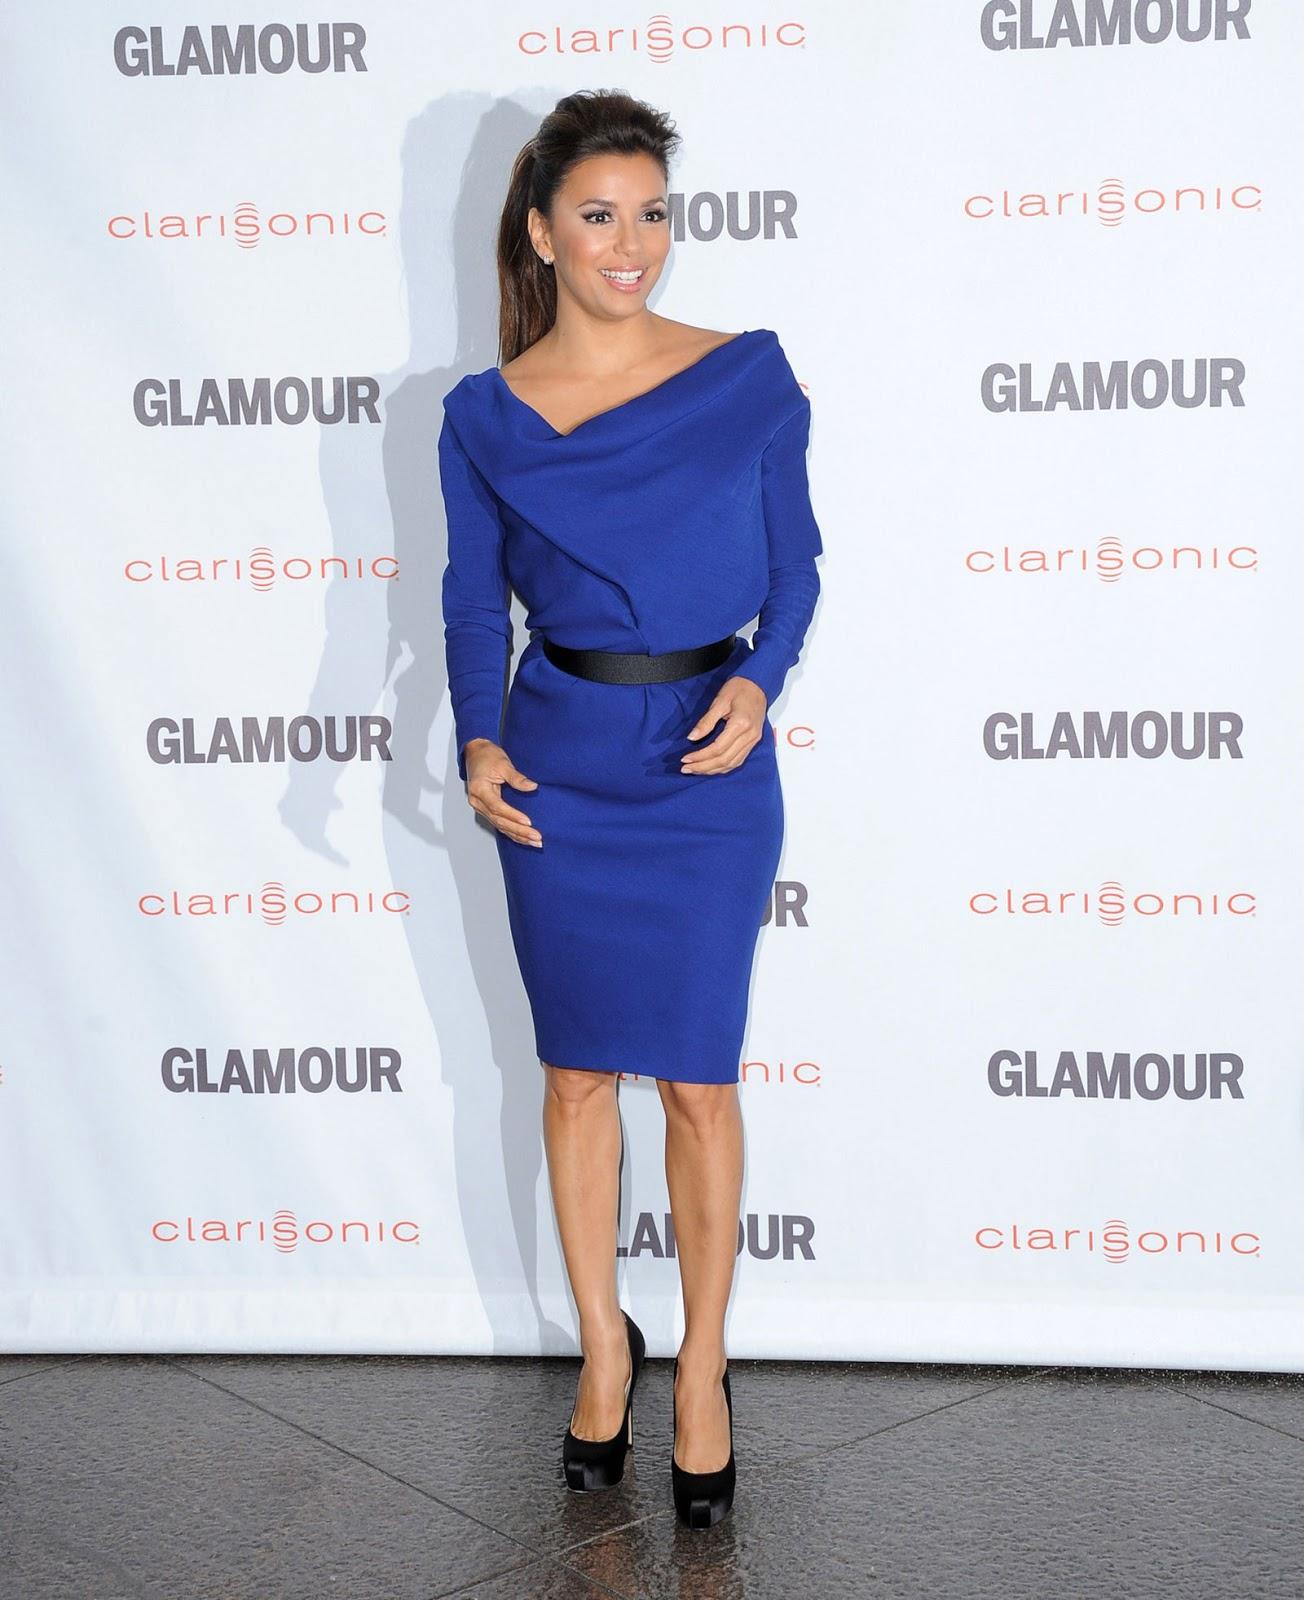 HQ Photos of Eva Longoria at Glamour Reel Moments